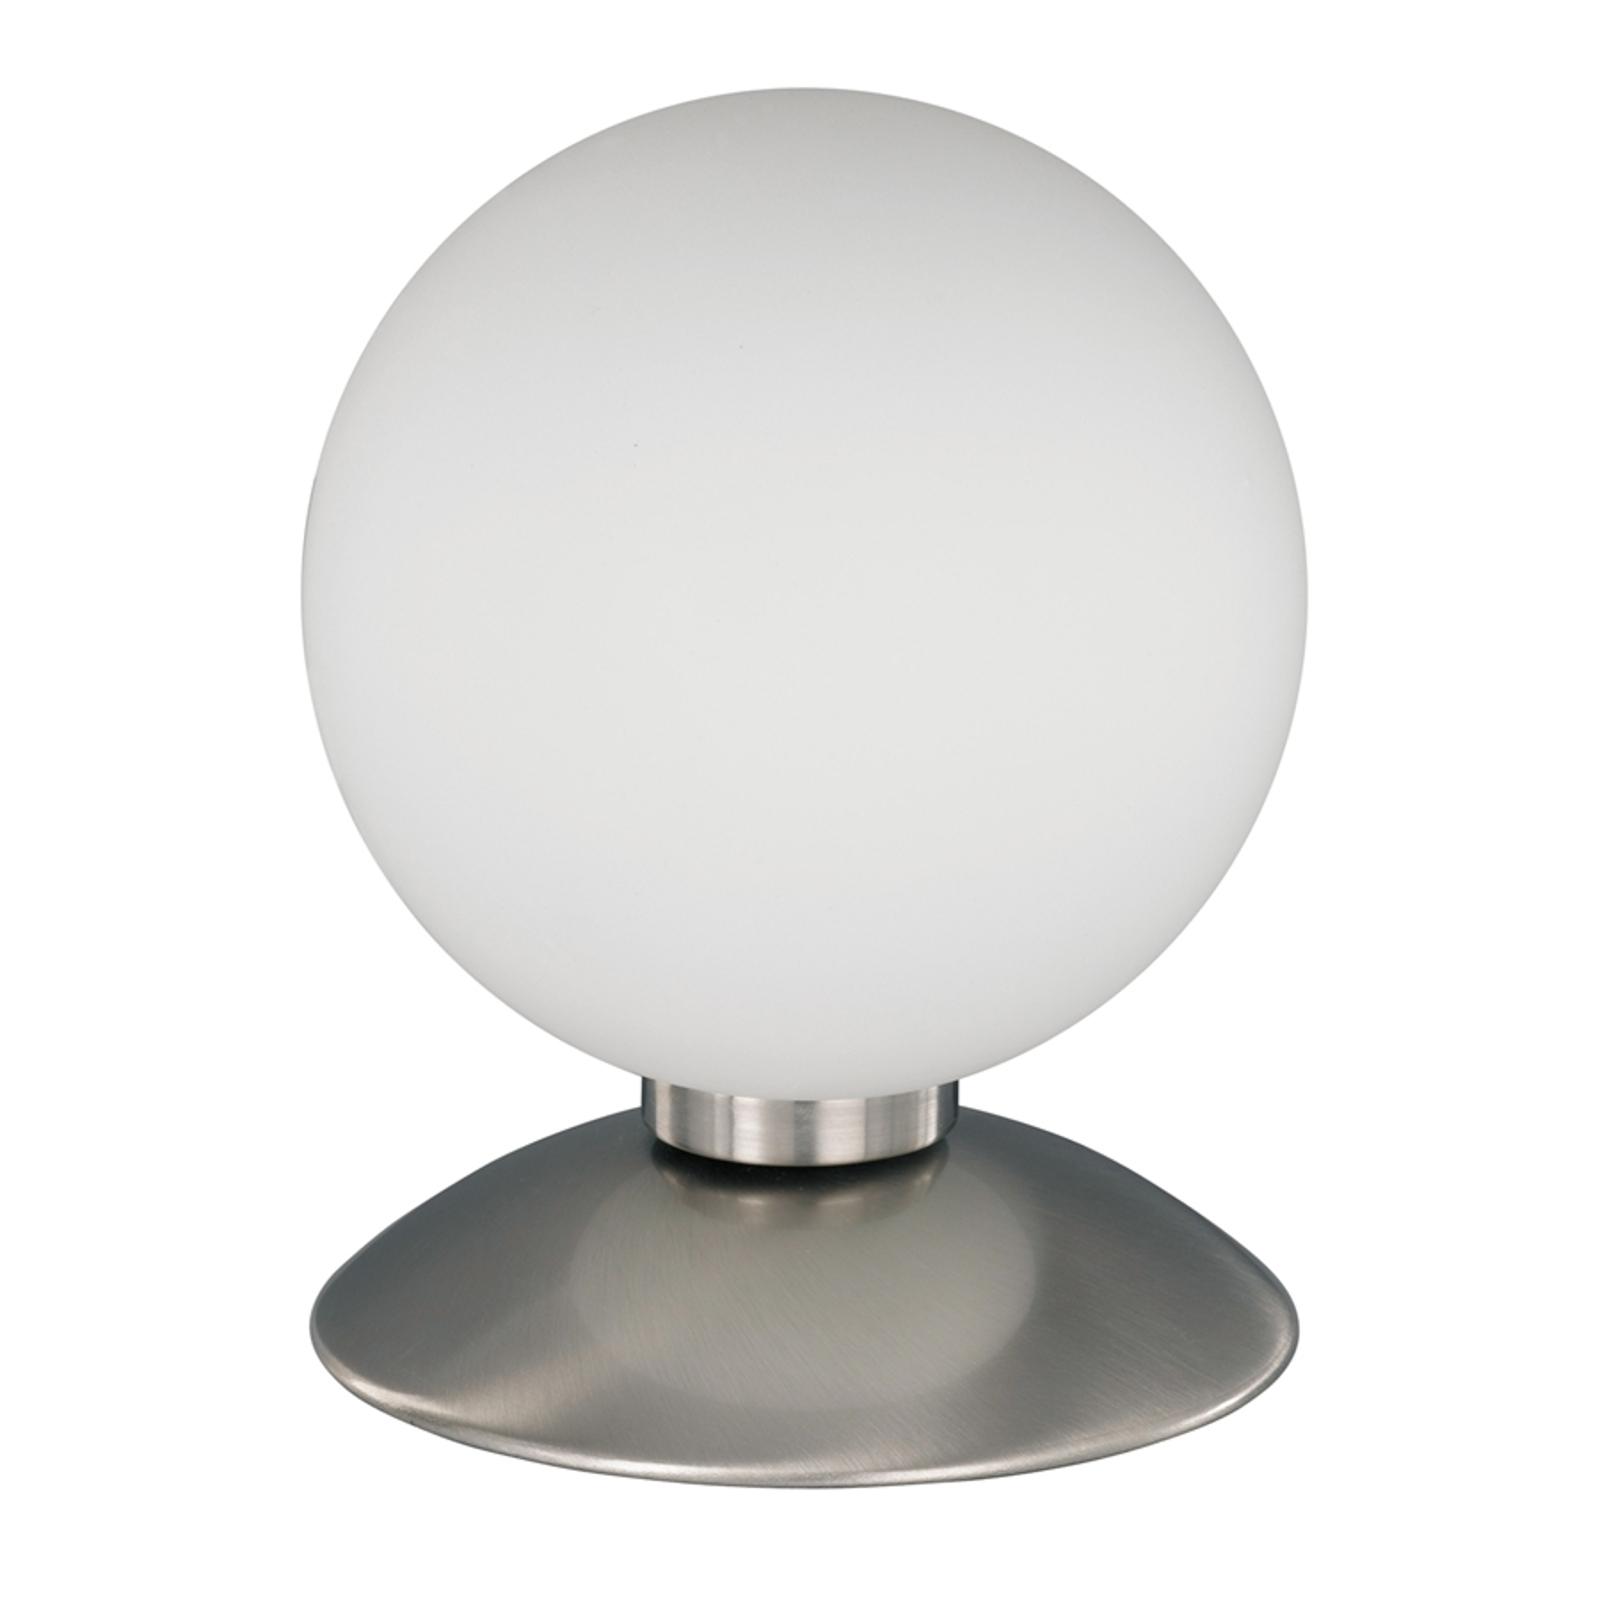 Lampada da tavolo sferica BUBBA, base look acciaio